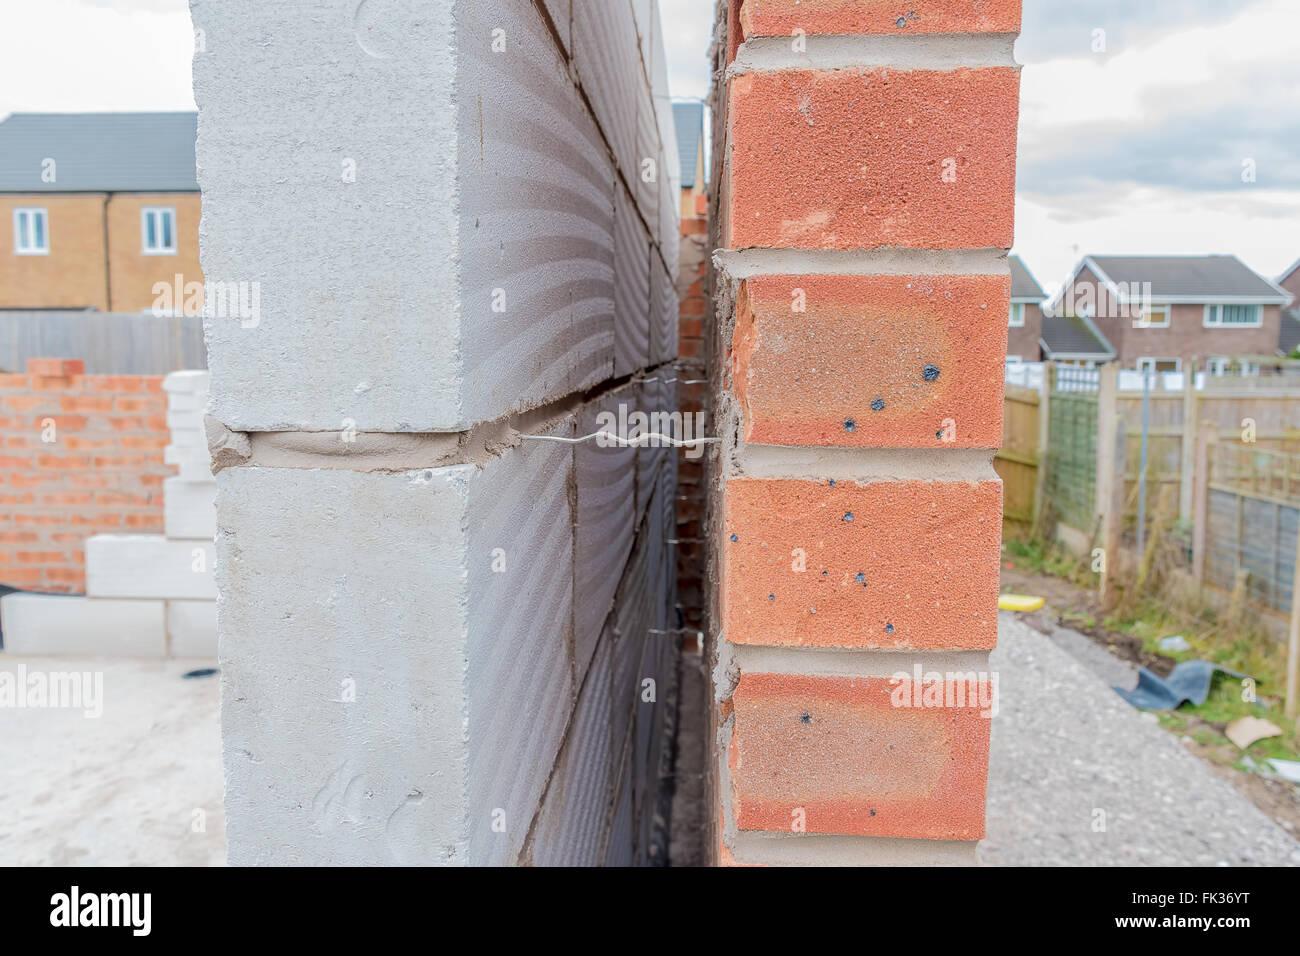 incontrare qualità autentica catturare Casa in varie fasi di costruzione mostra parete metallica ...